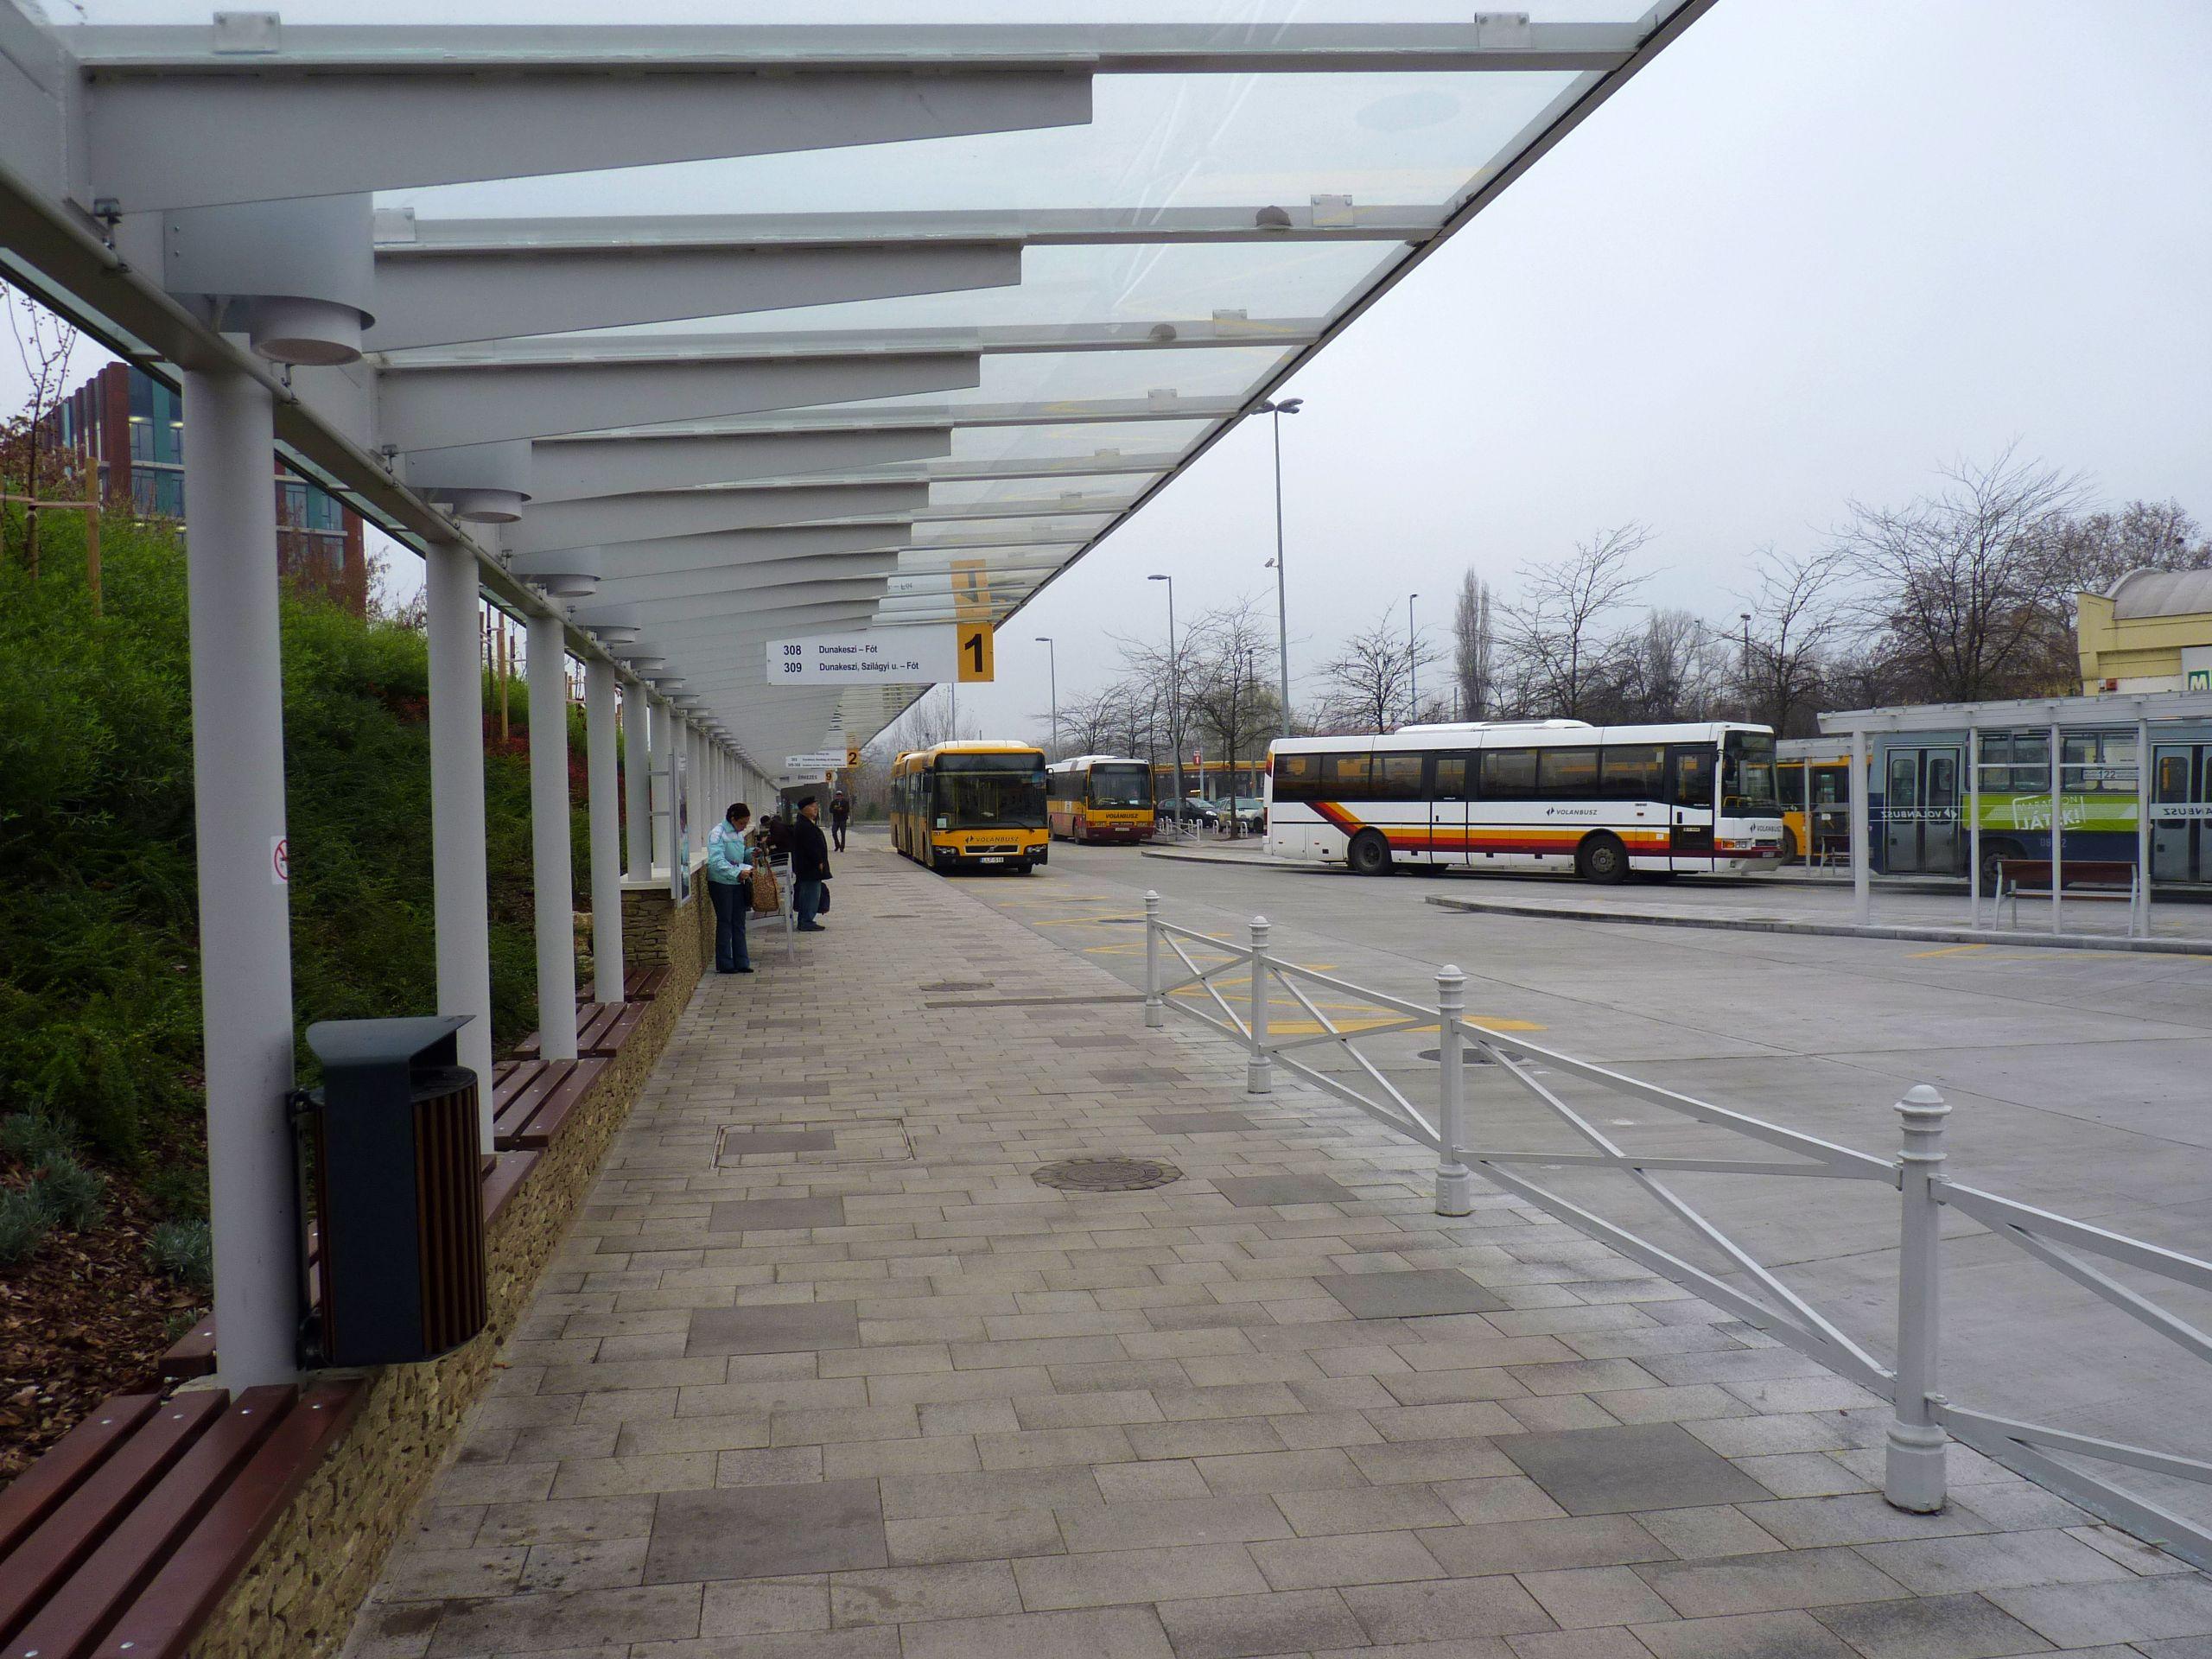 Ujpest Varoskapu Autobusz Allomas Wikipedia